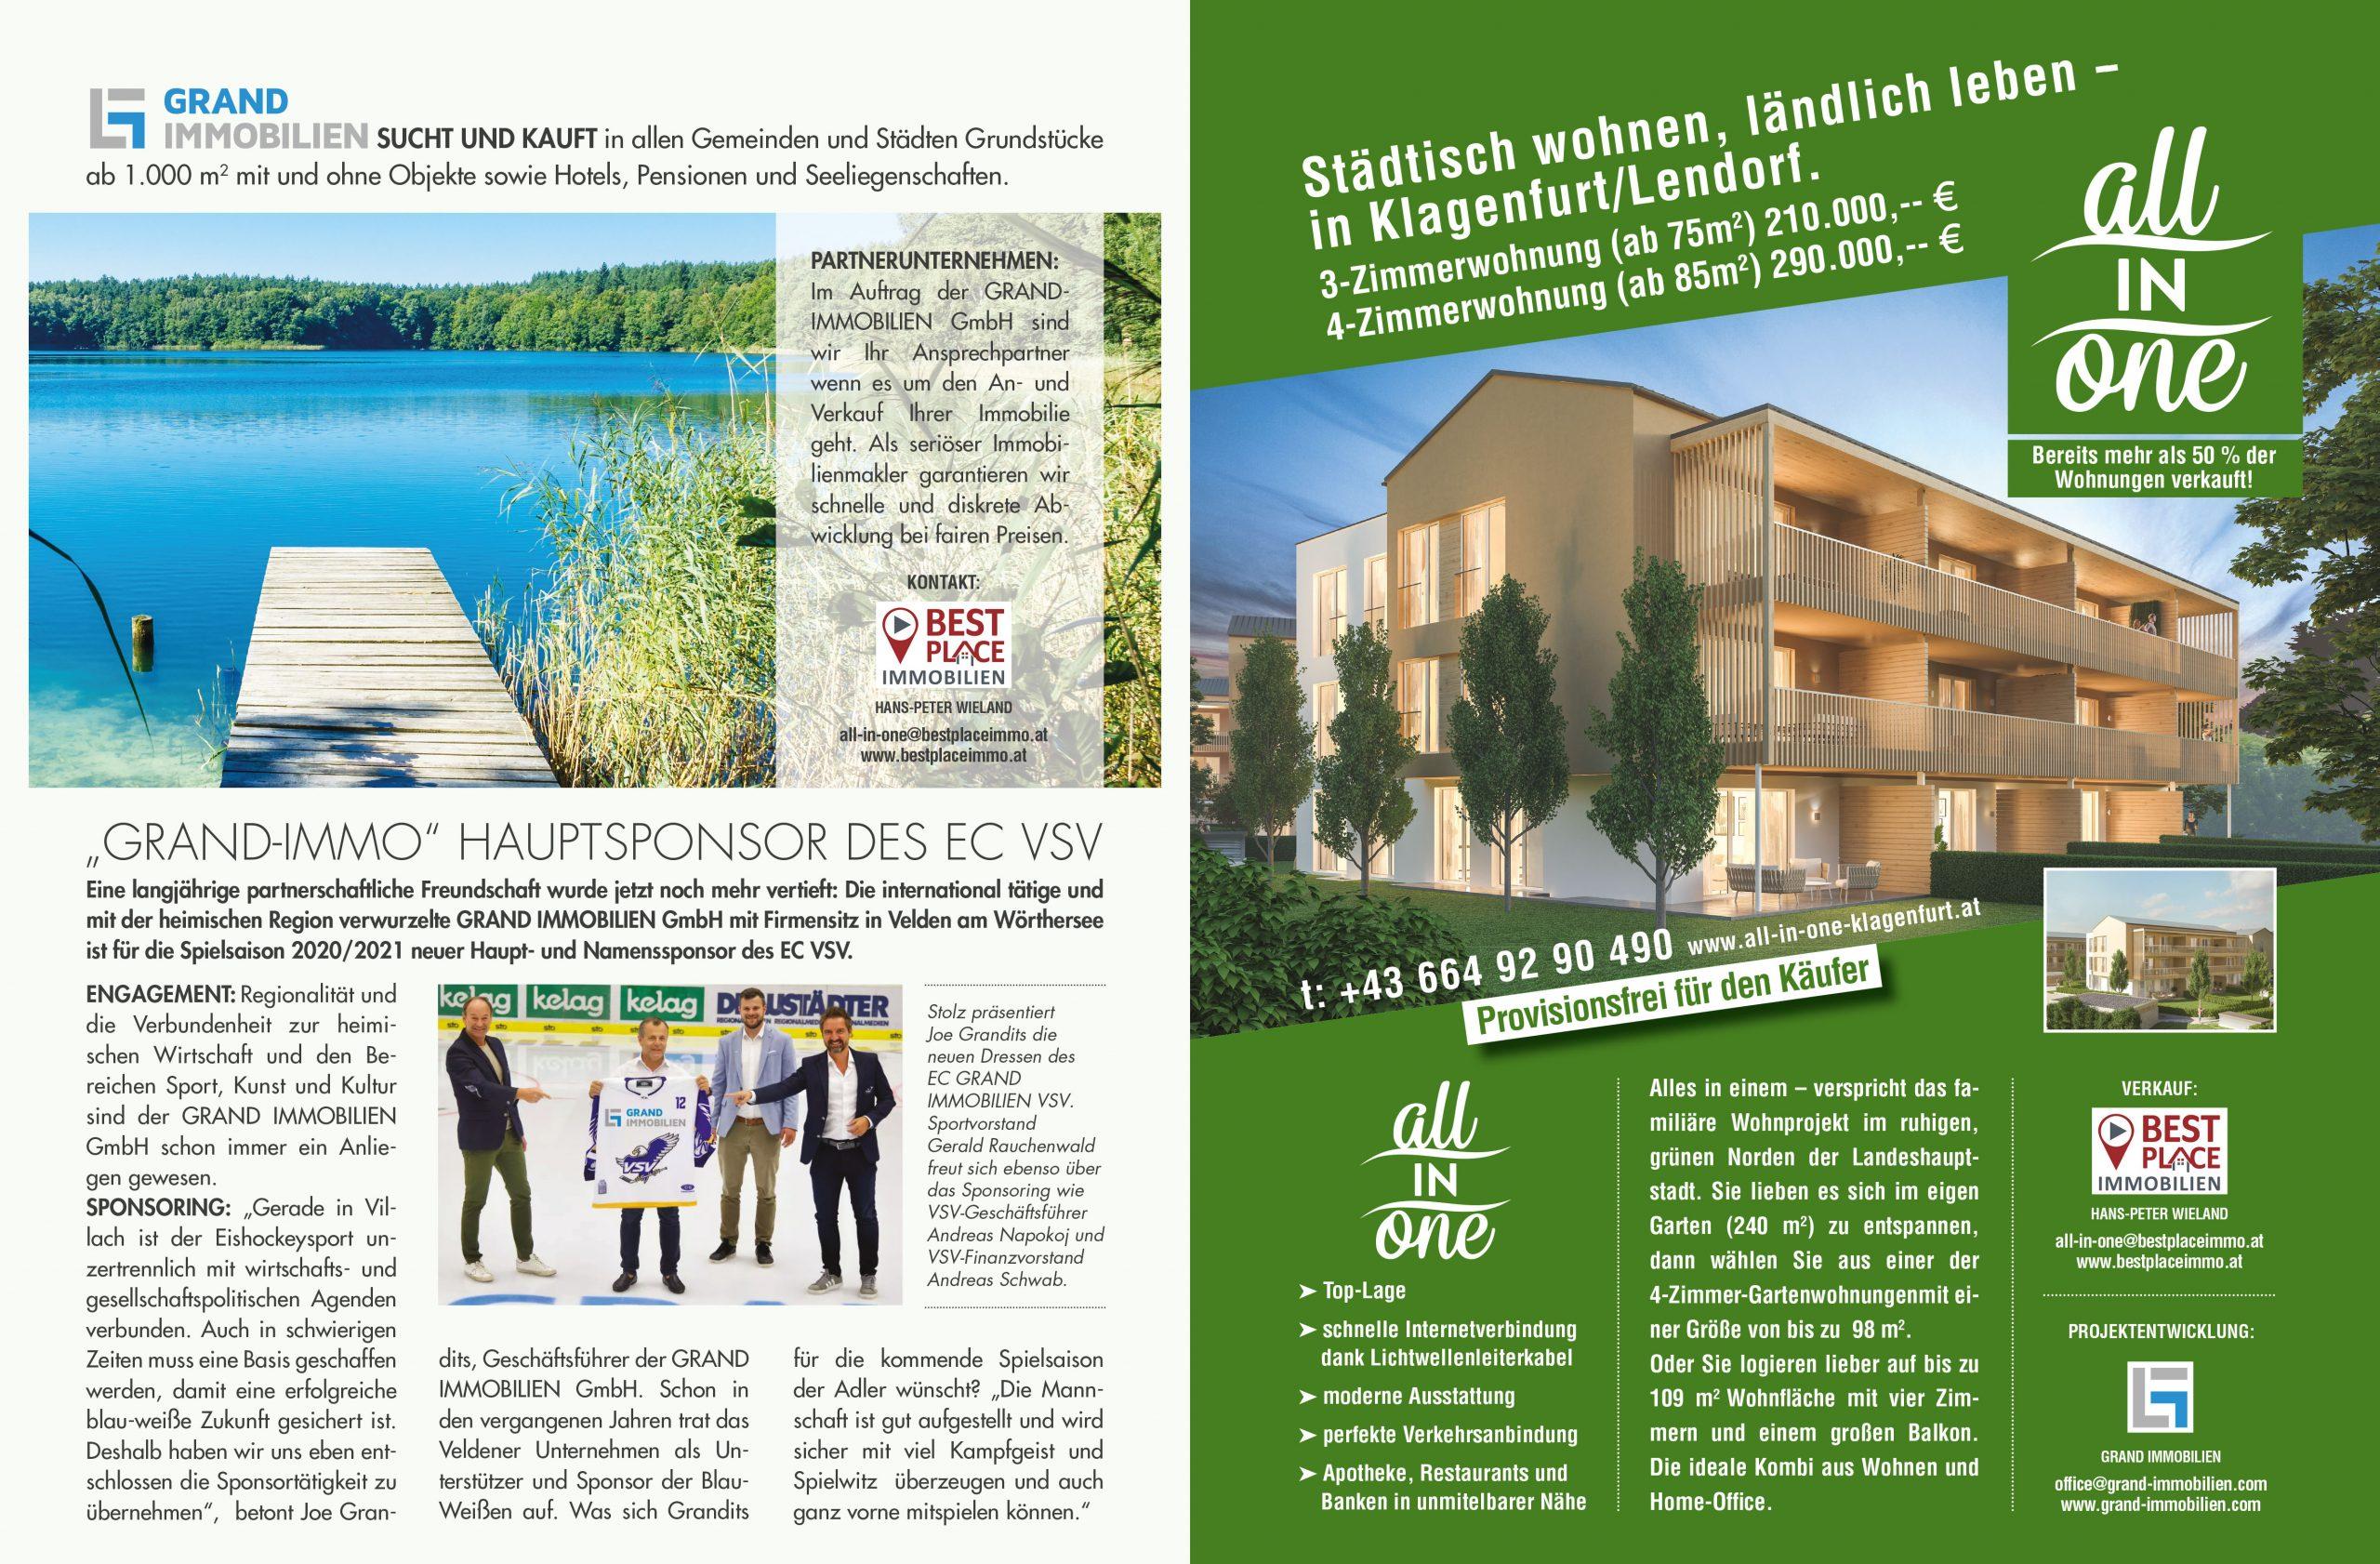 Grand Immobilien - All in one Klagenfurt